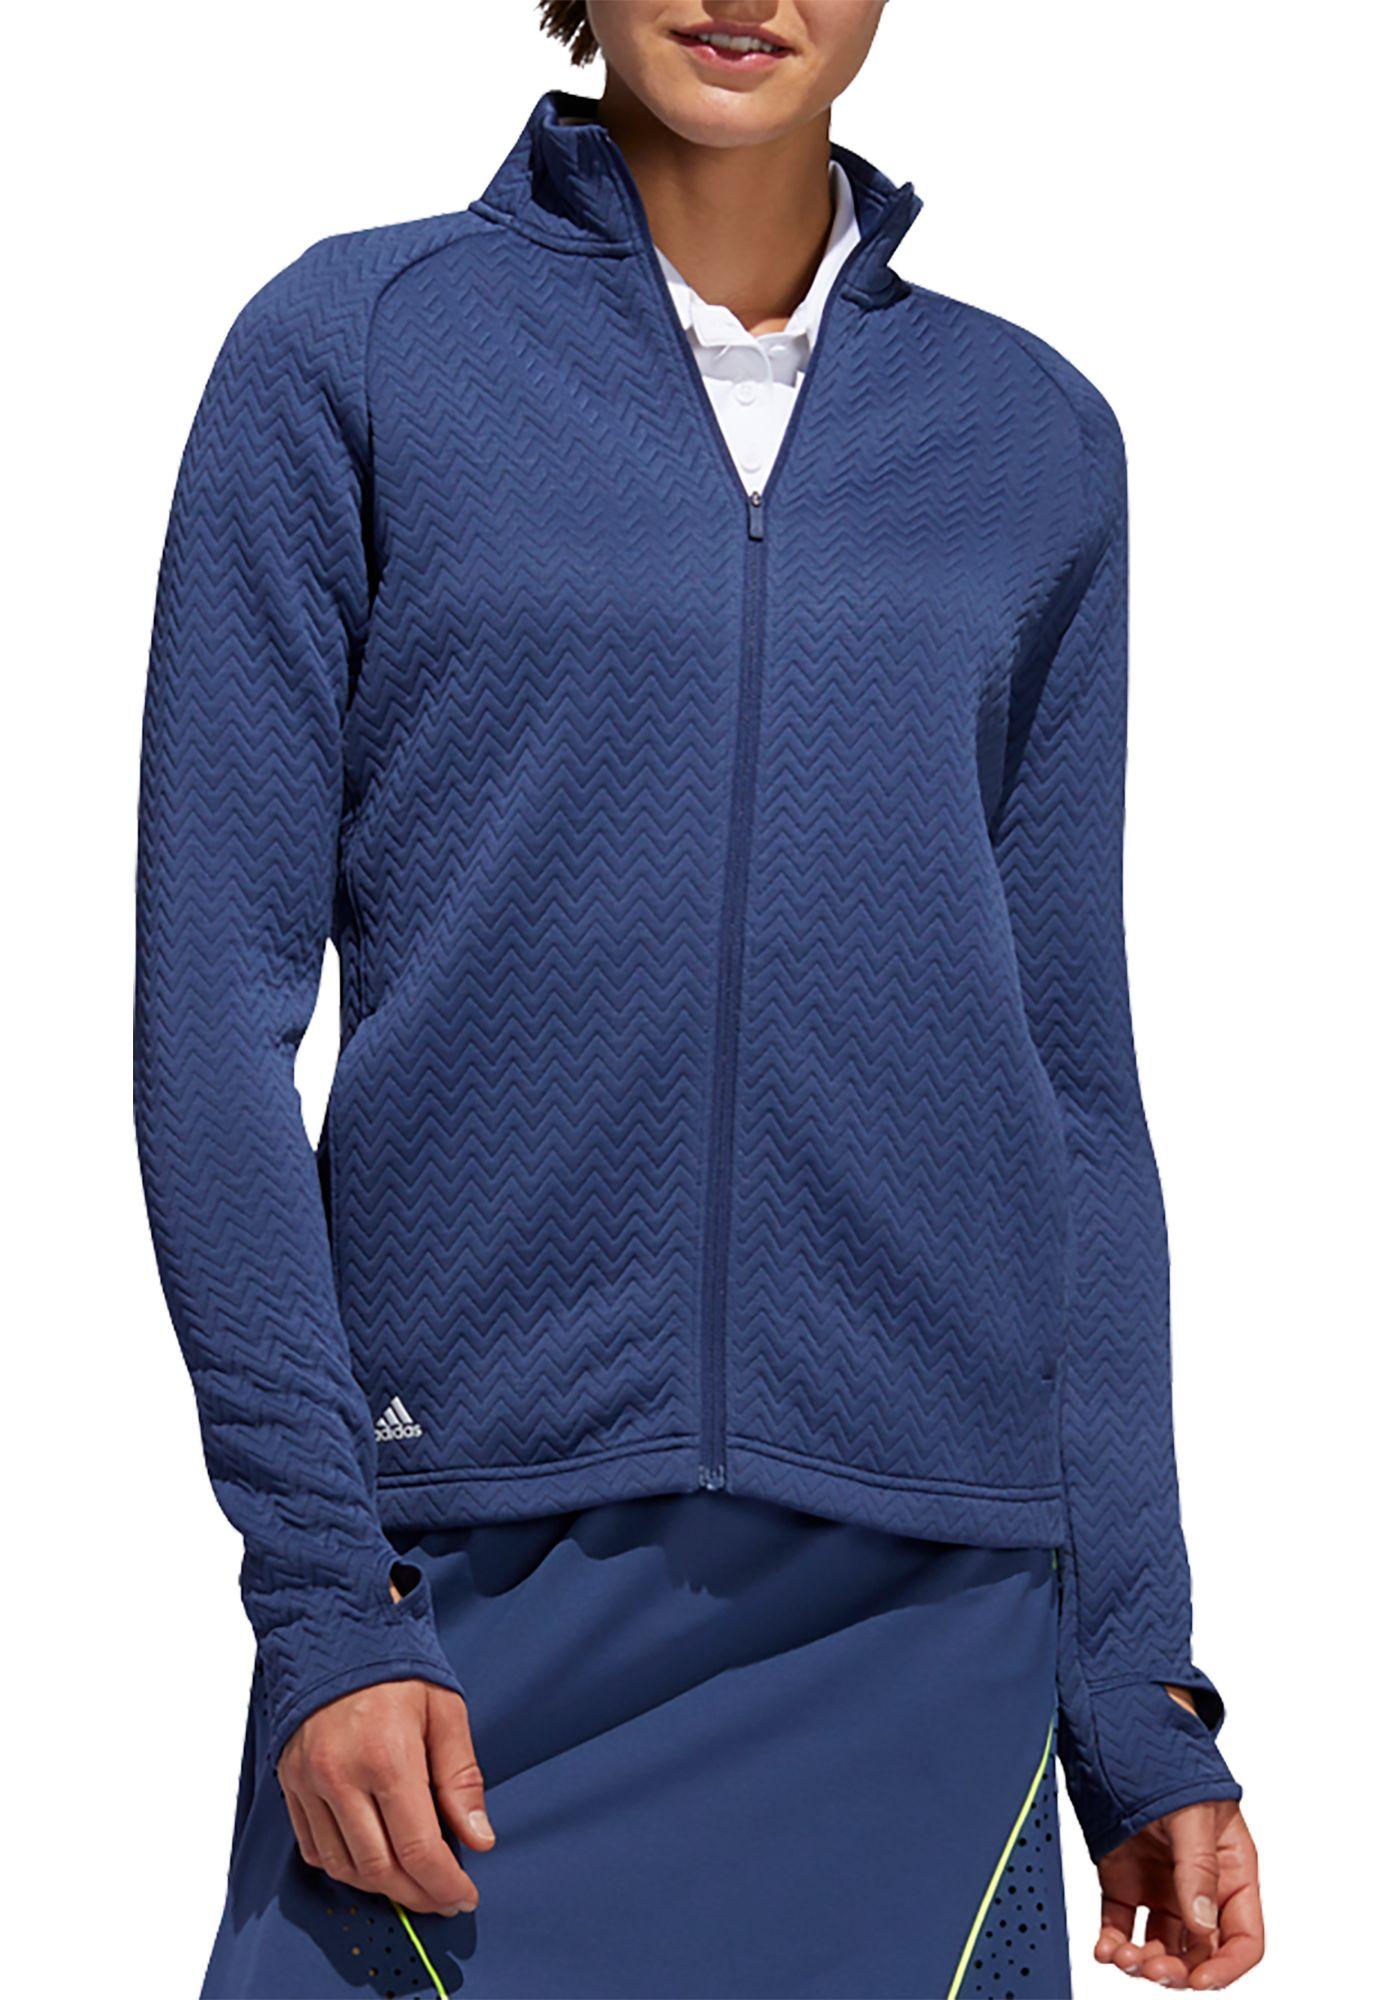 adidas Women's Textured Full-Zip Golf Jacket